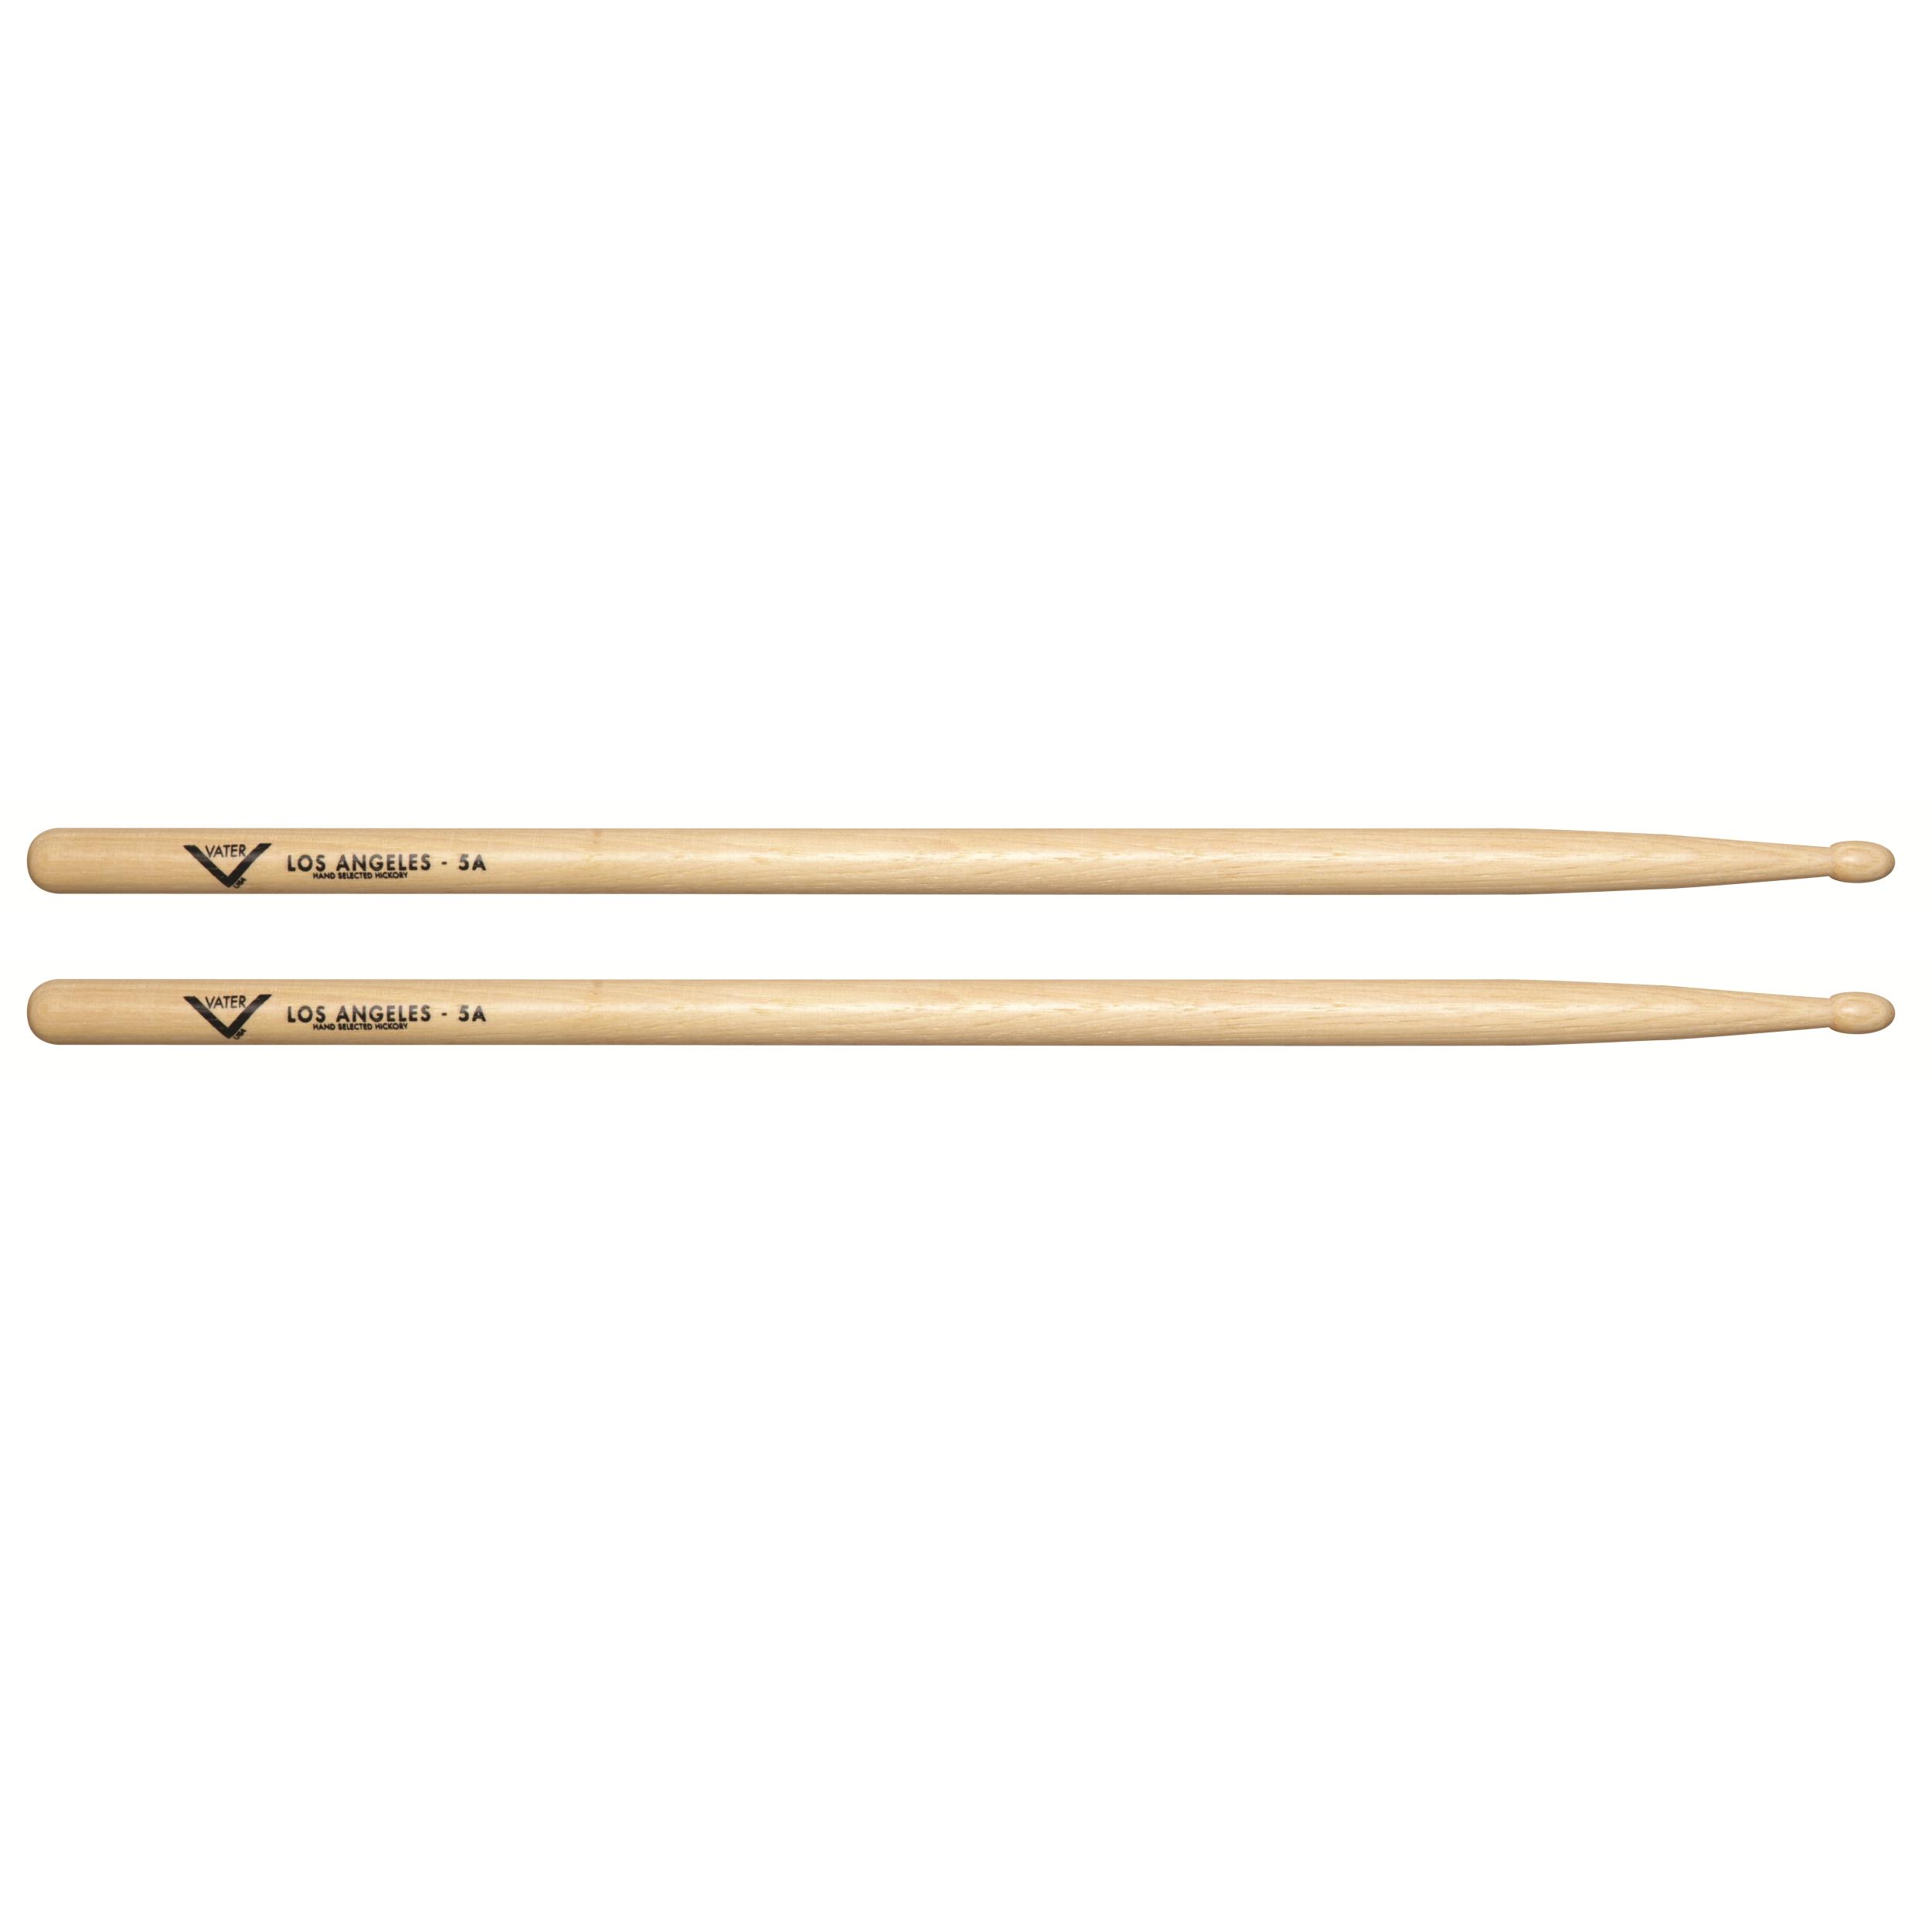 vater vh5aw los angeles 5a wood tip hickory drum sticks pair musical instruments. Black Bedroom Furniture Sets. Home Design Ideas